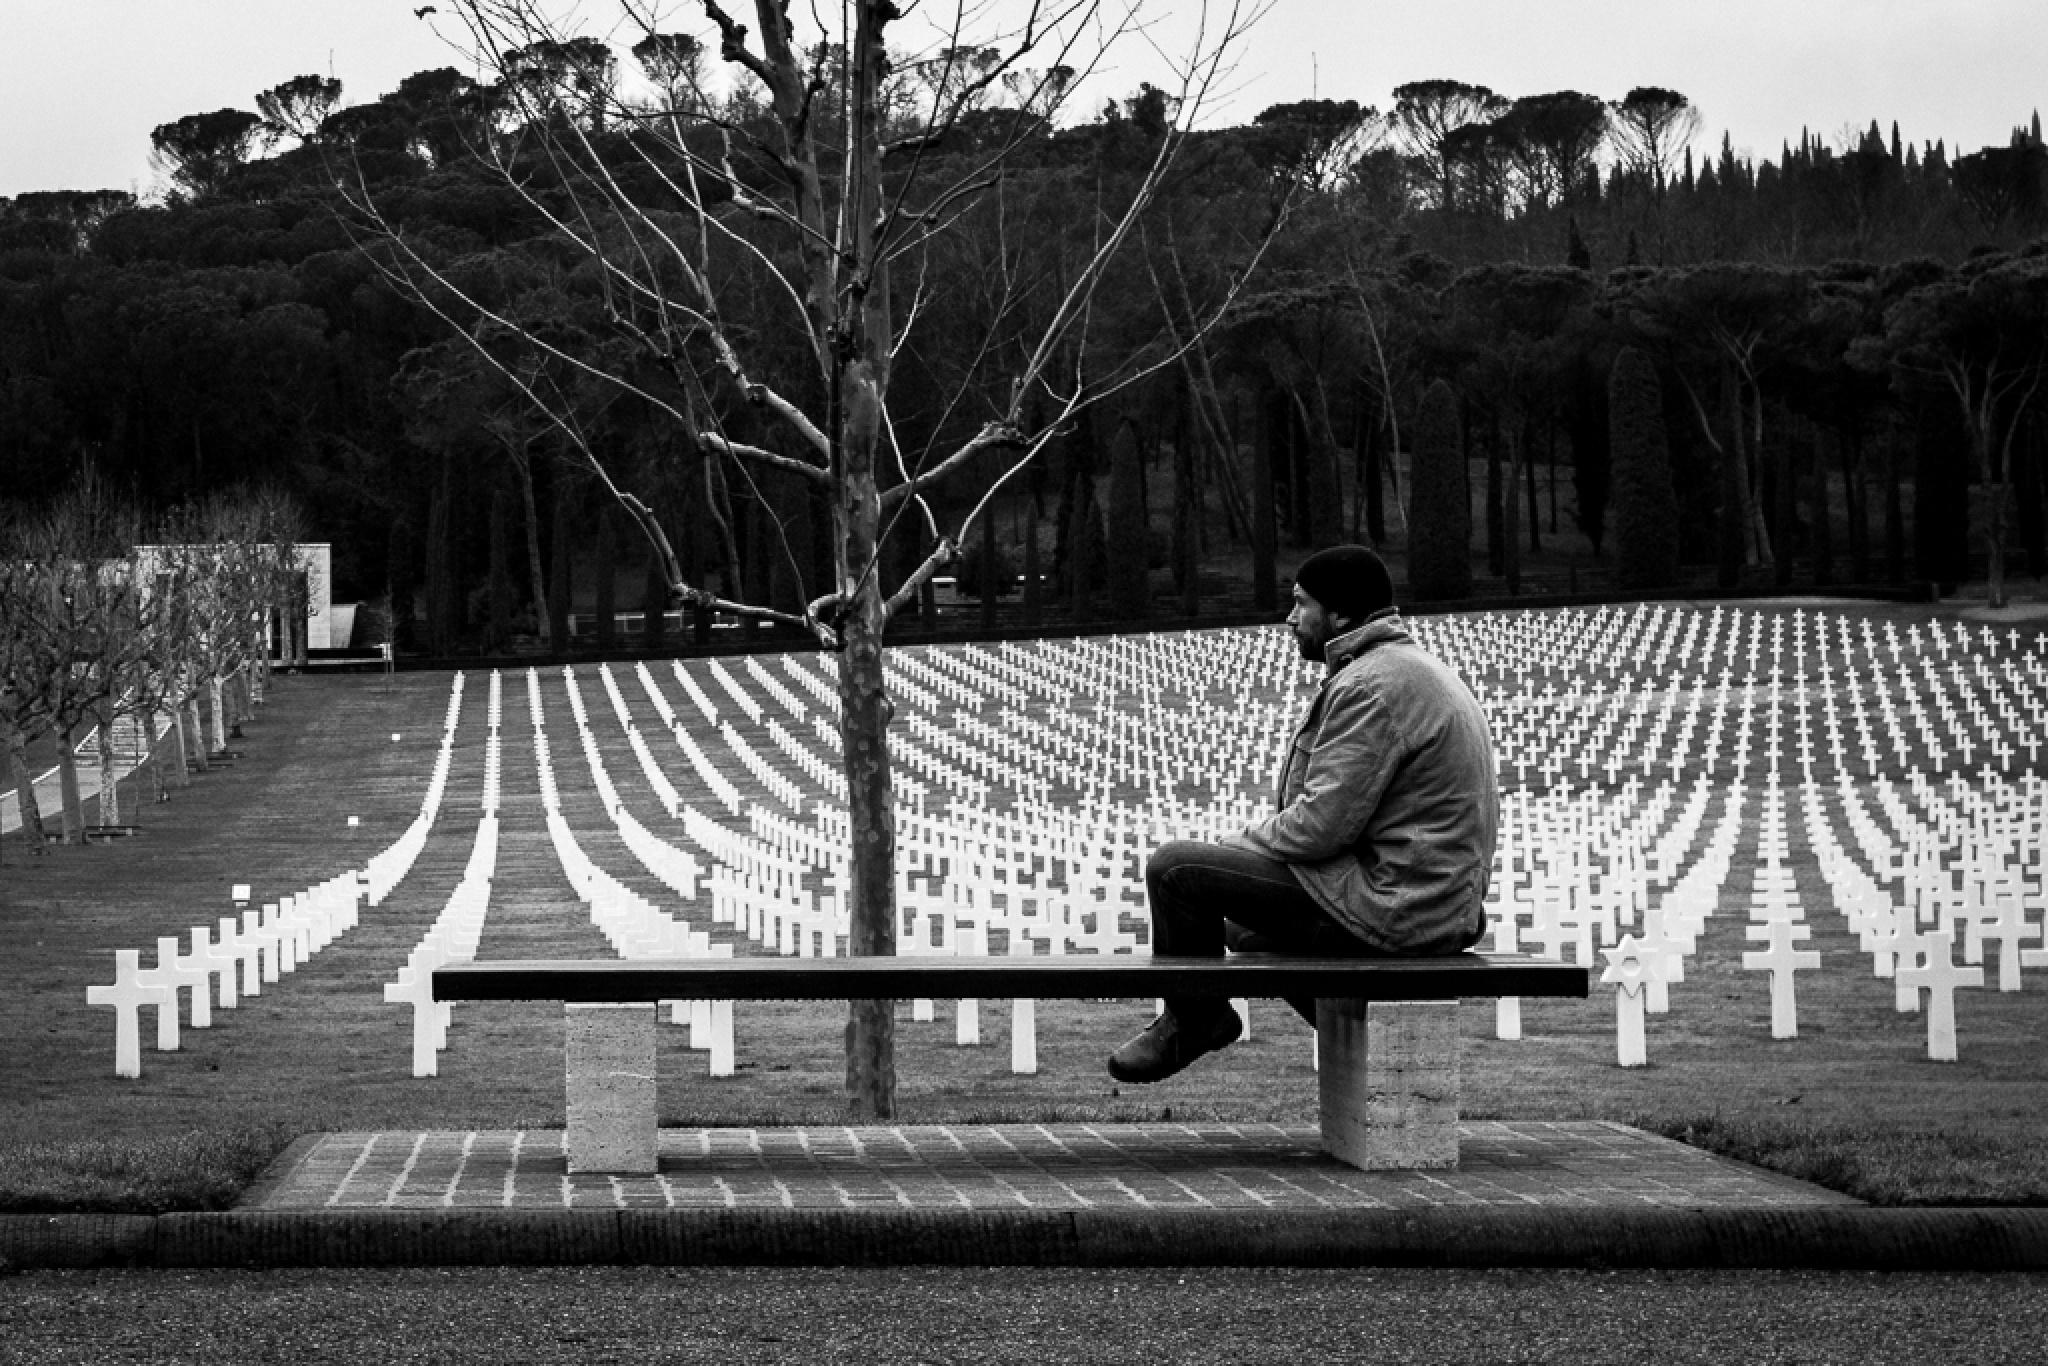 sound of silence by Francesco Monari